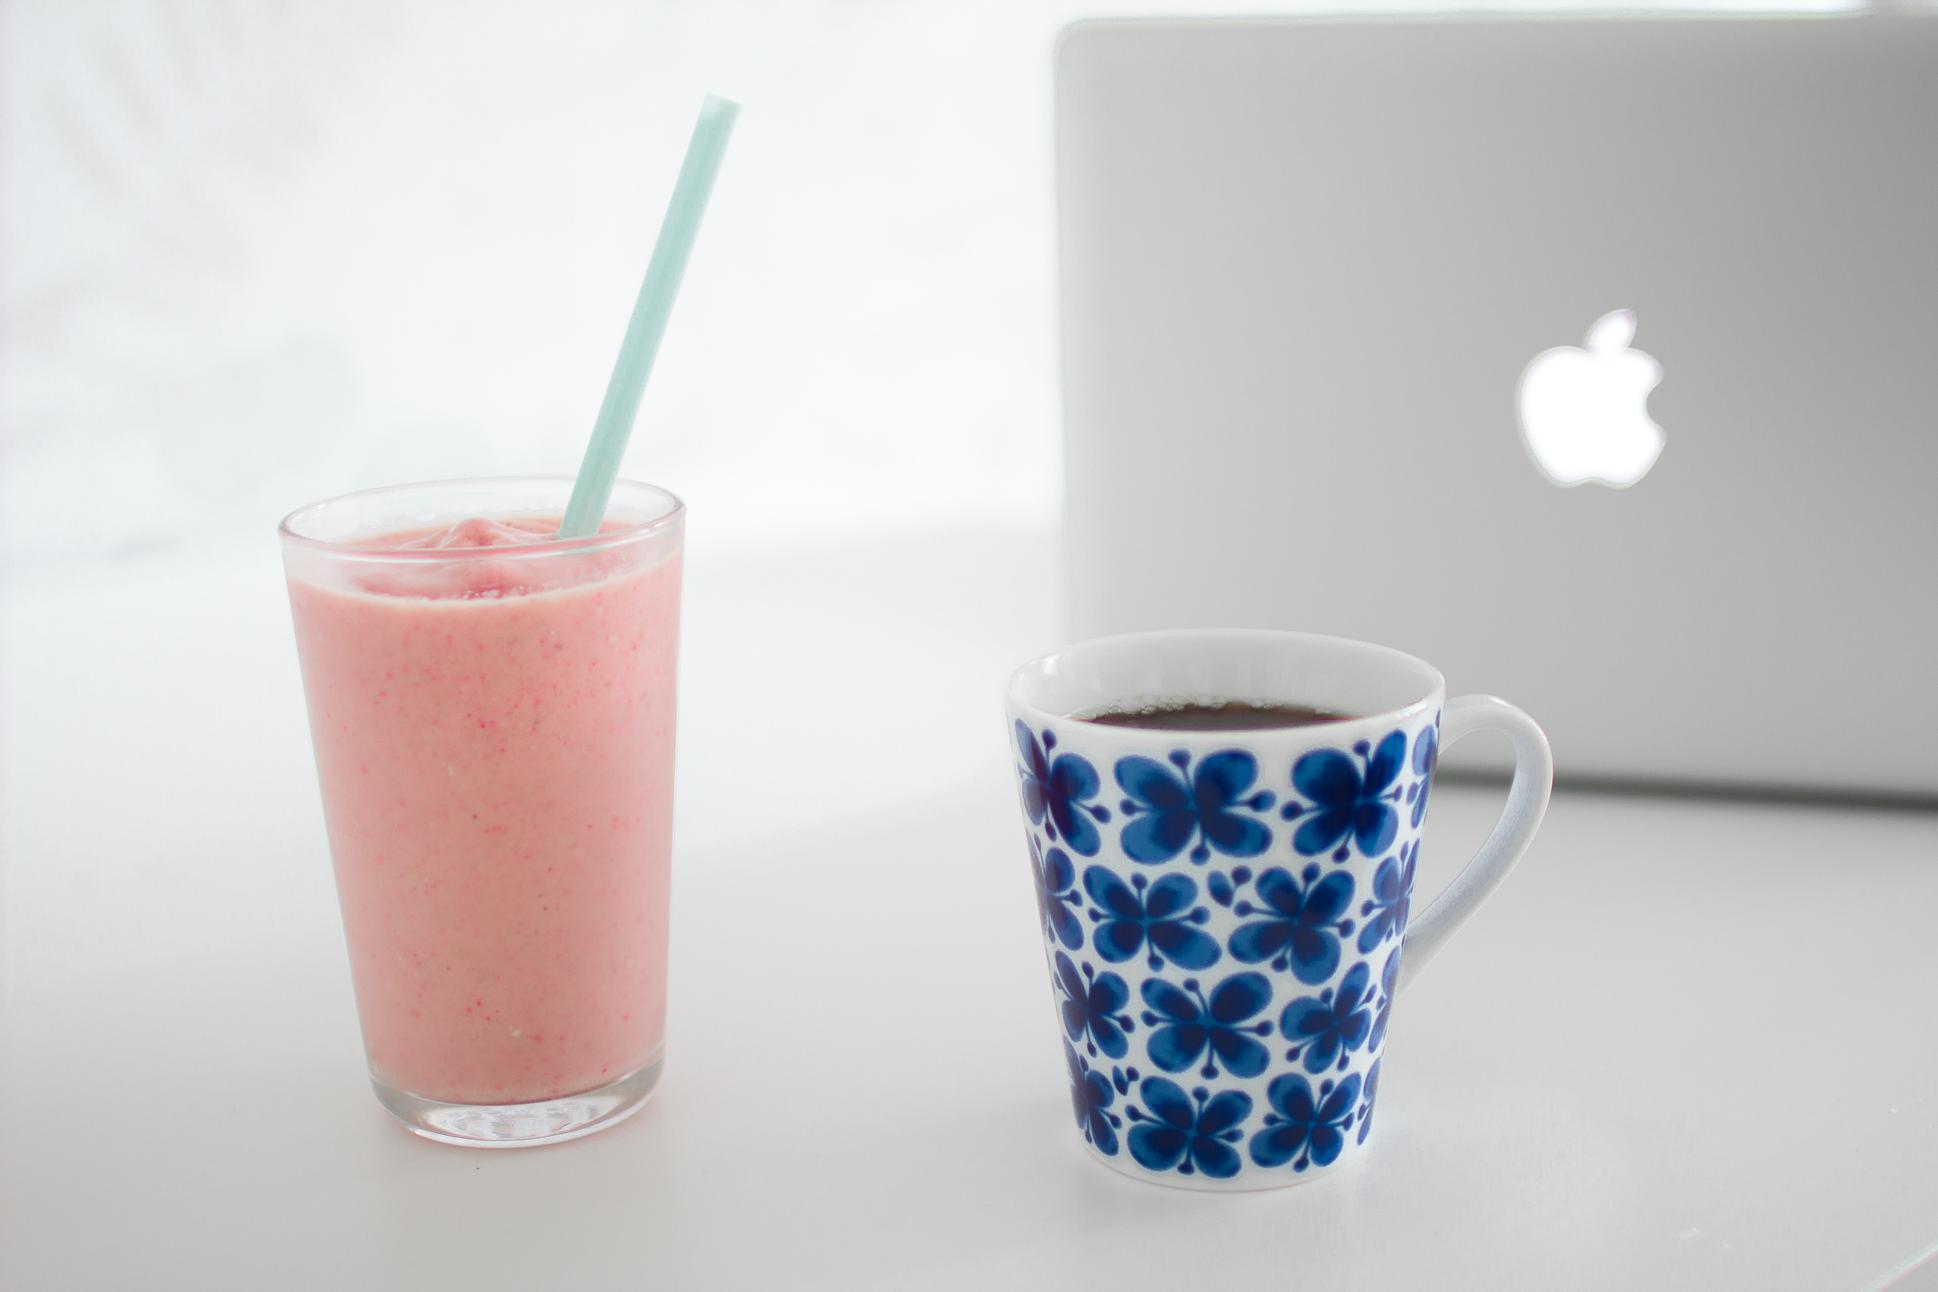 Fruktig smoothie & redigering